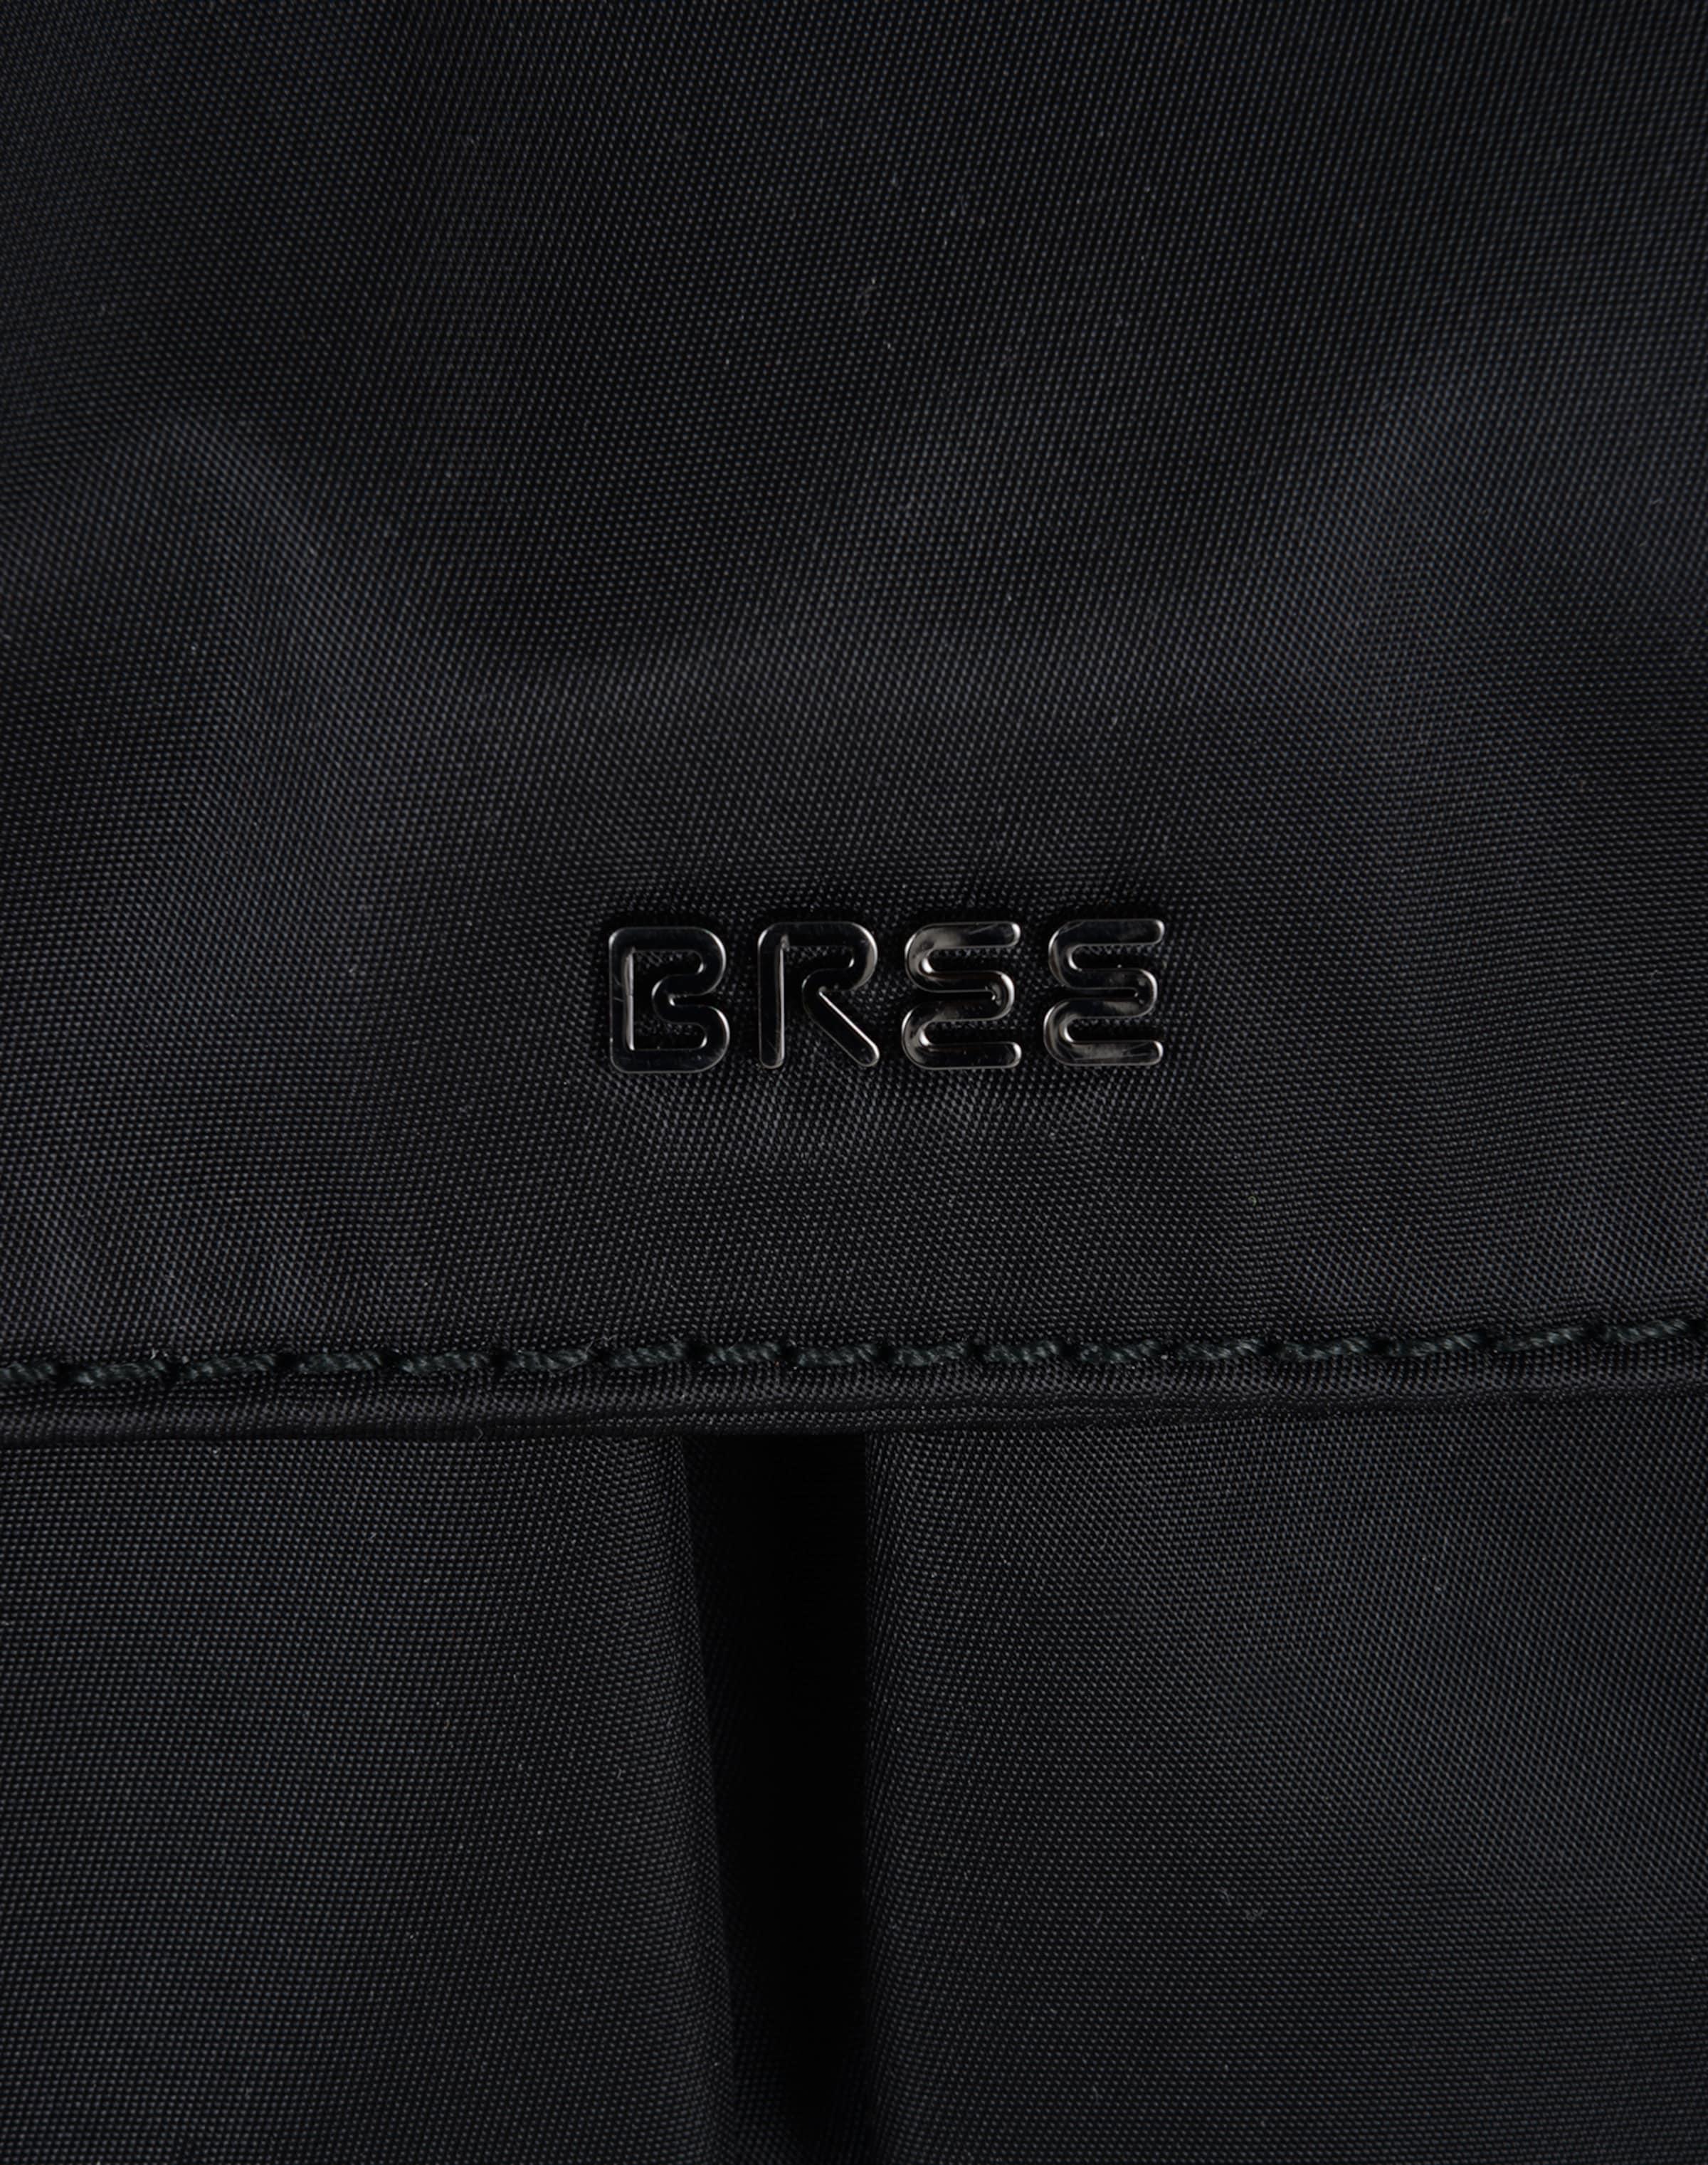 Messenger 'Barcelona' Bag 'Barcelona' BREE Messenger BREE BREE Messenger Bag Bag Bag BREE 'Barcelona' Messenger x1YqOwf55